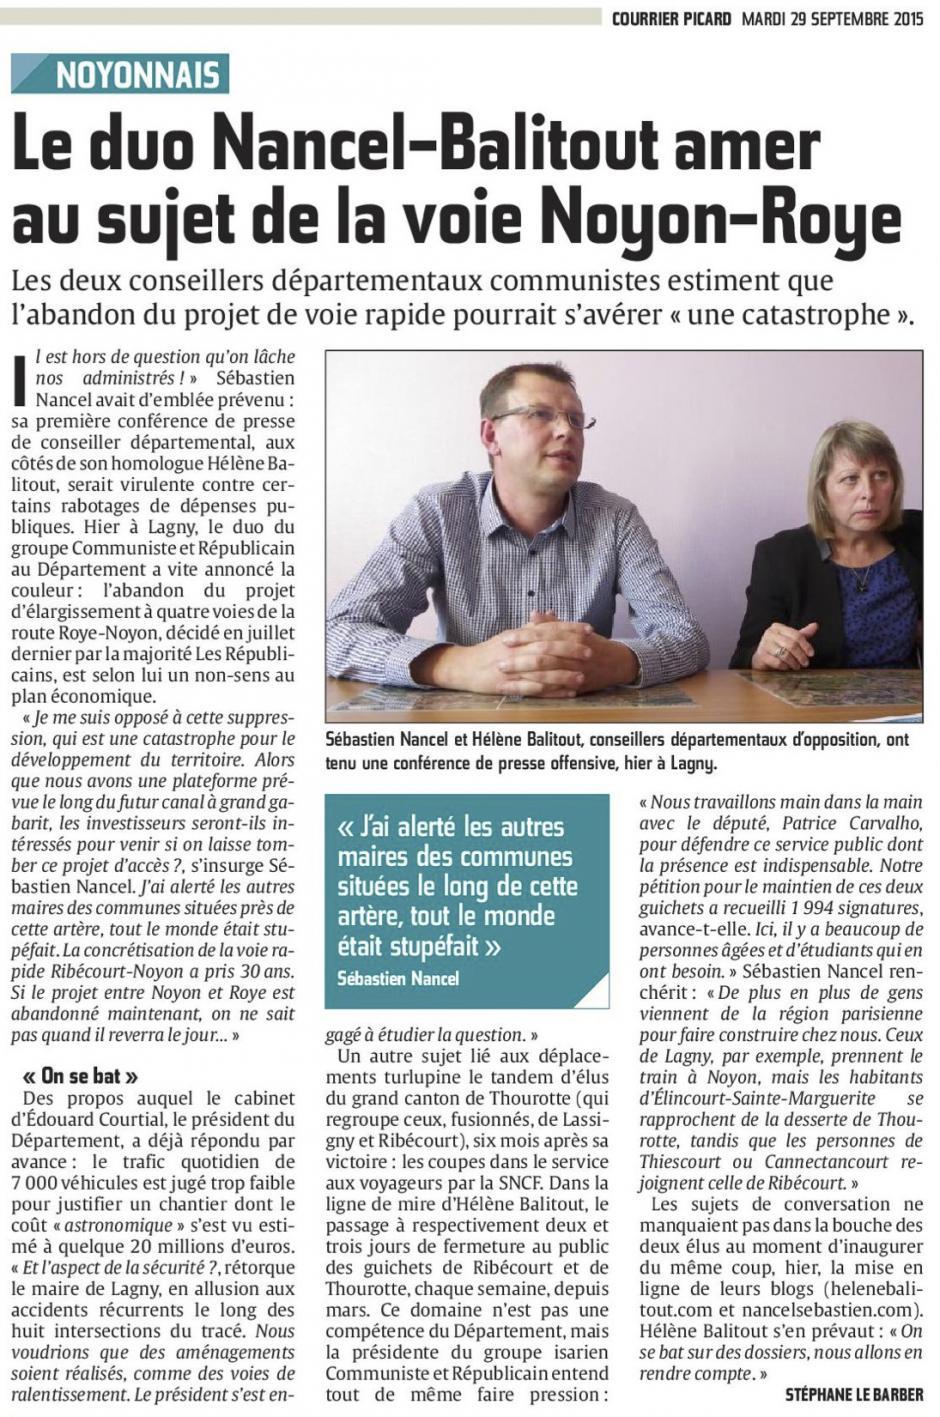 20150929-CP-Noyonnais-Le duo Nancel-Balitout amer au sujet de la voie Noyon-Roye